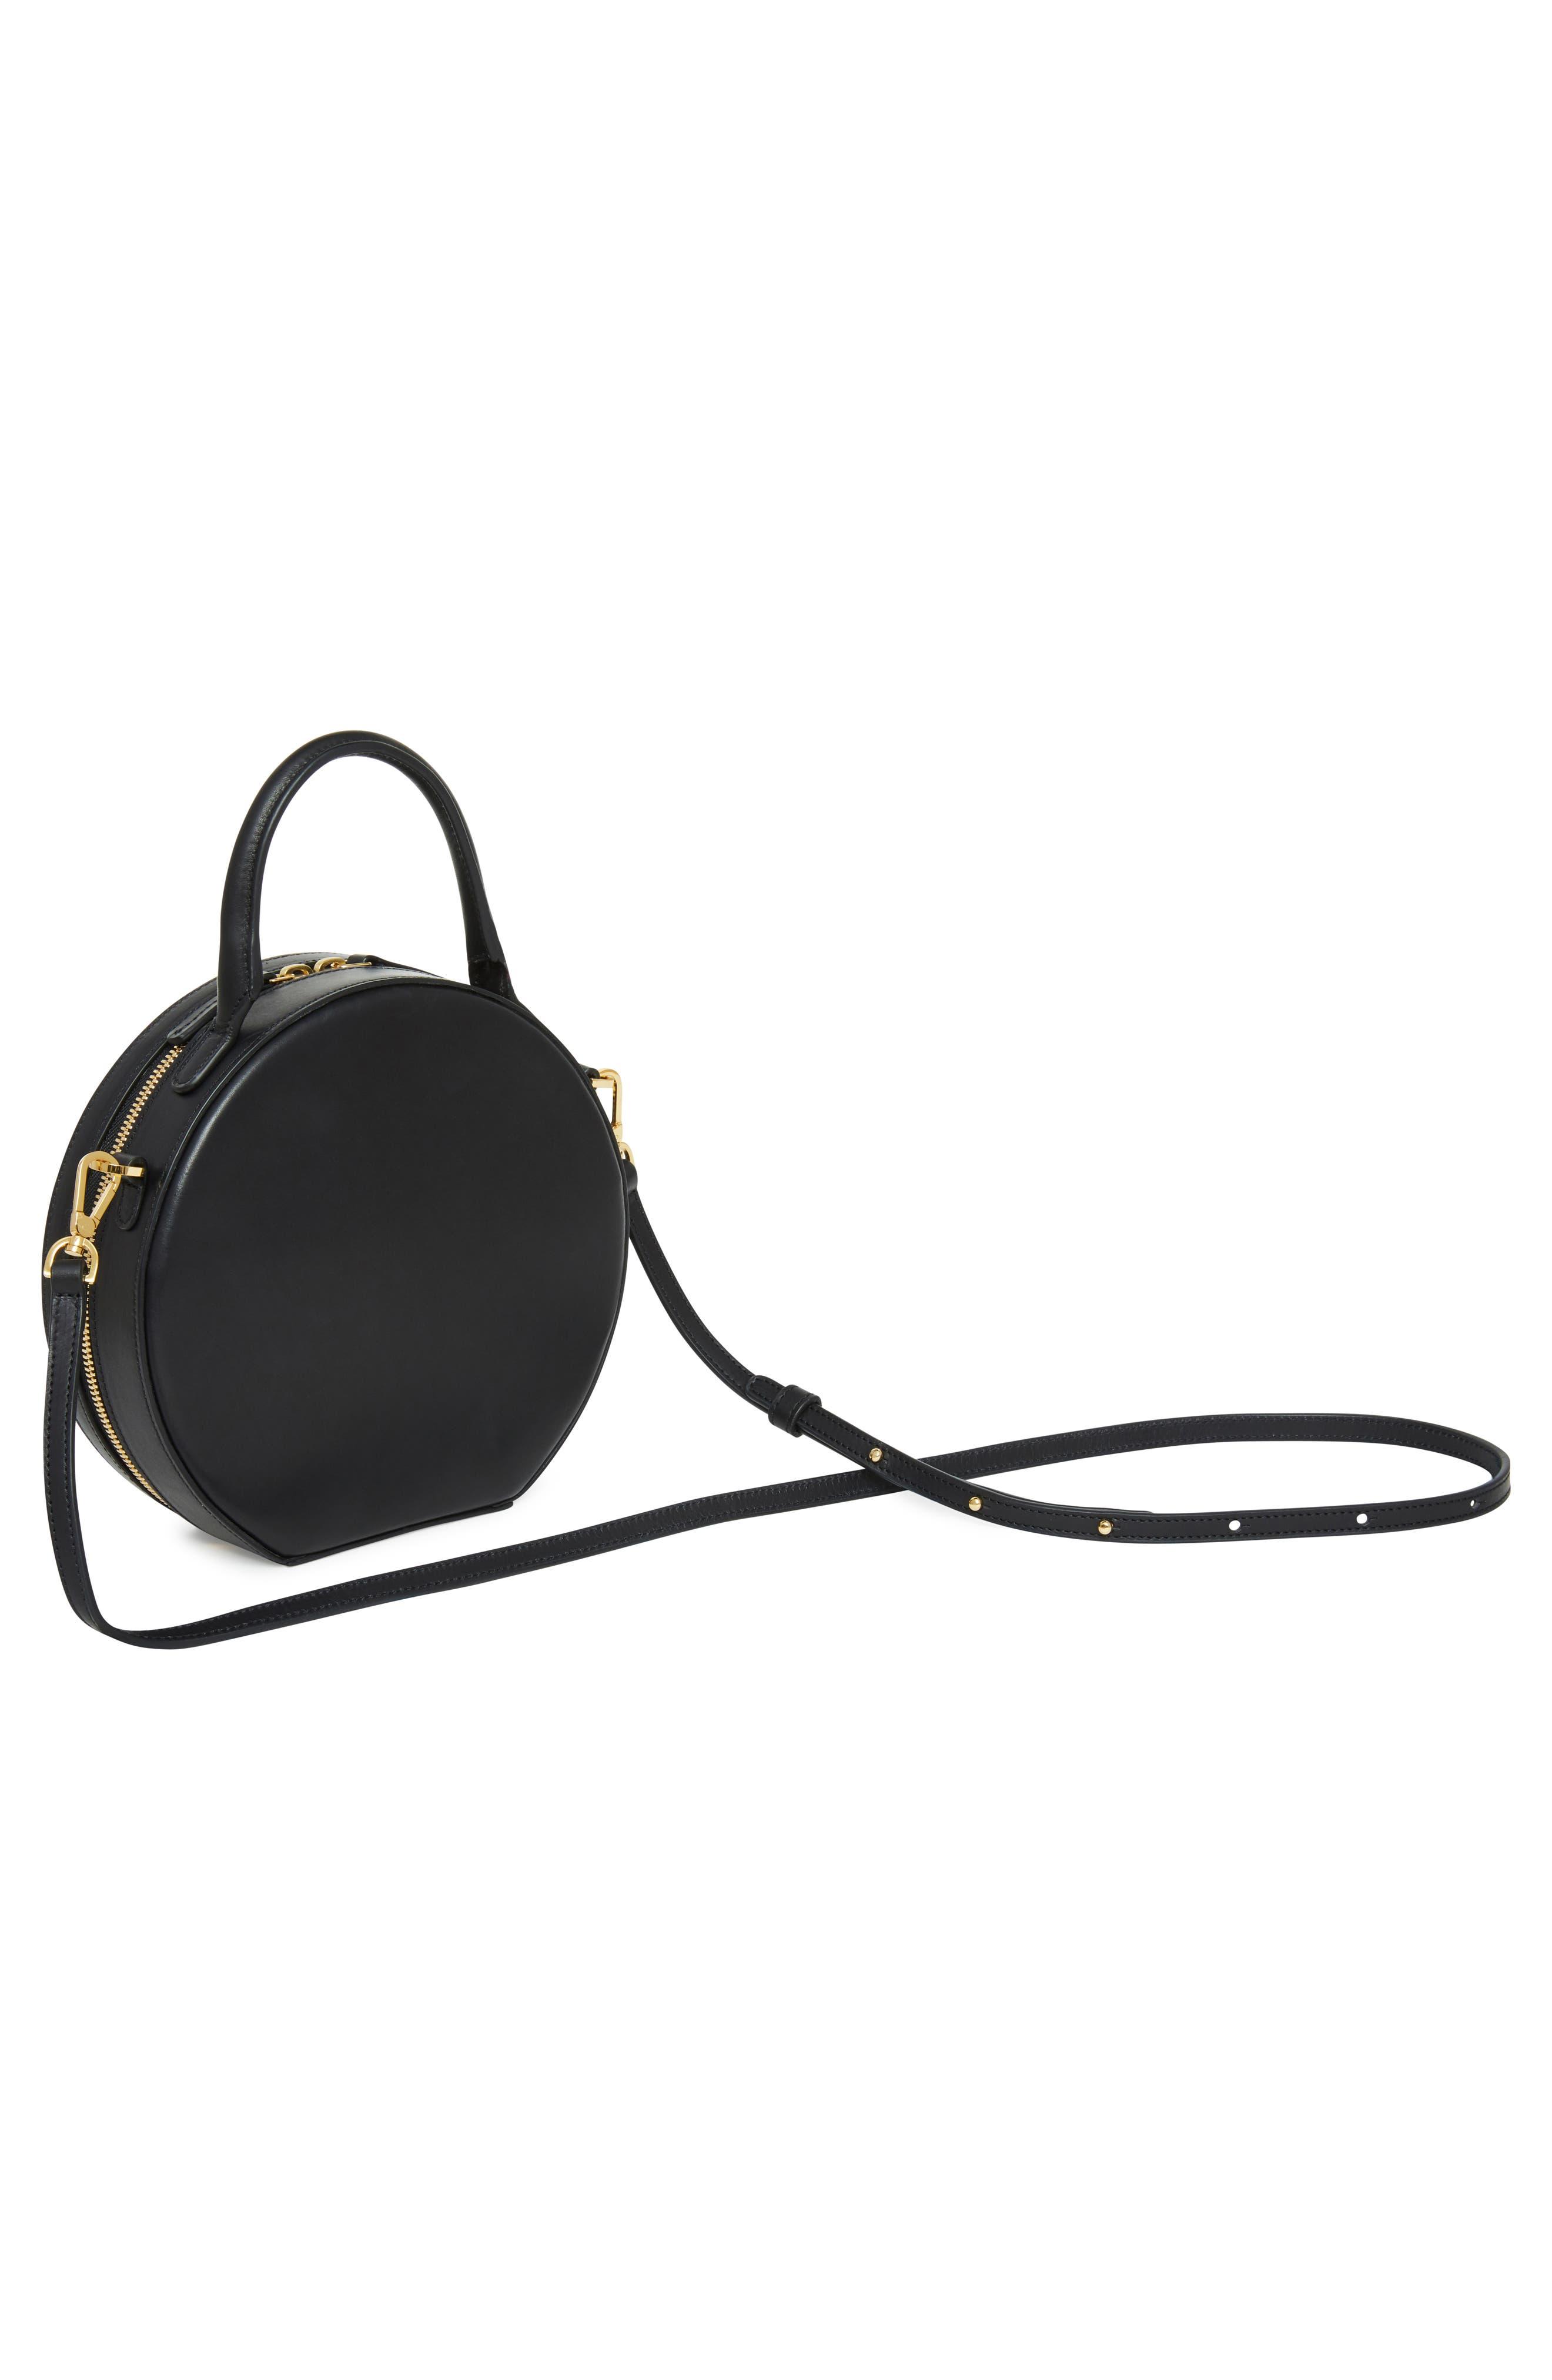 MANSUR GAVRIEL, Leather Circle Crossbody Bag, Alternate thumbnail 4, color, BLACK